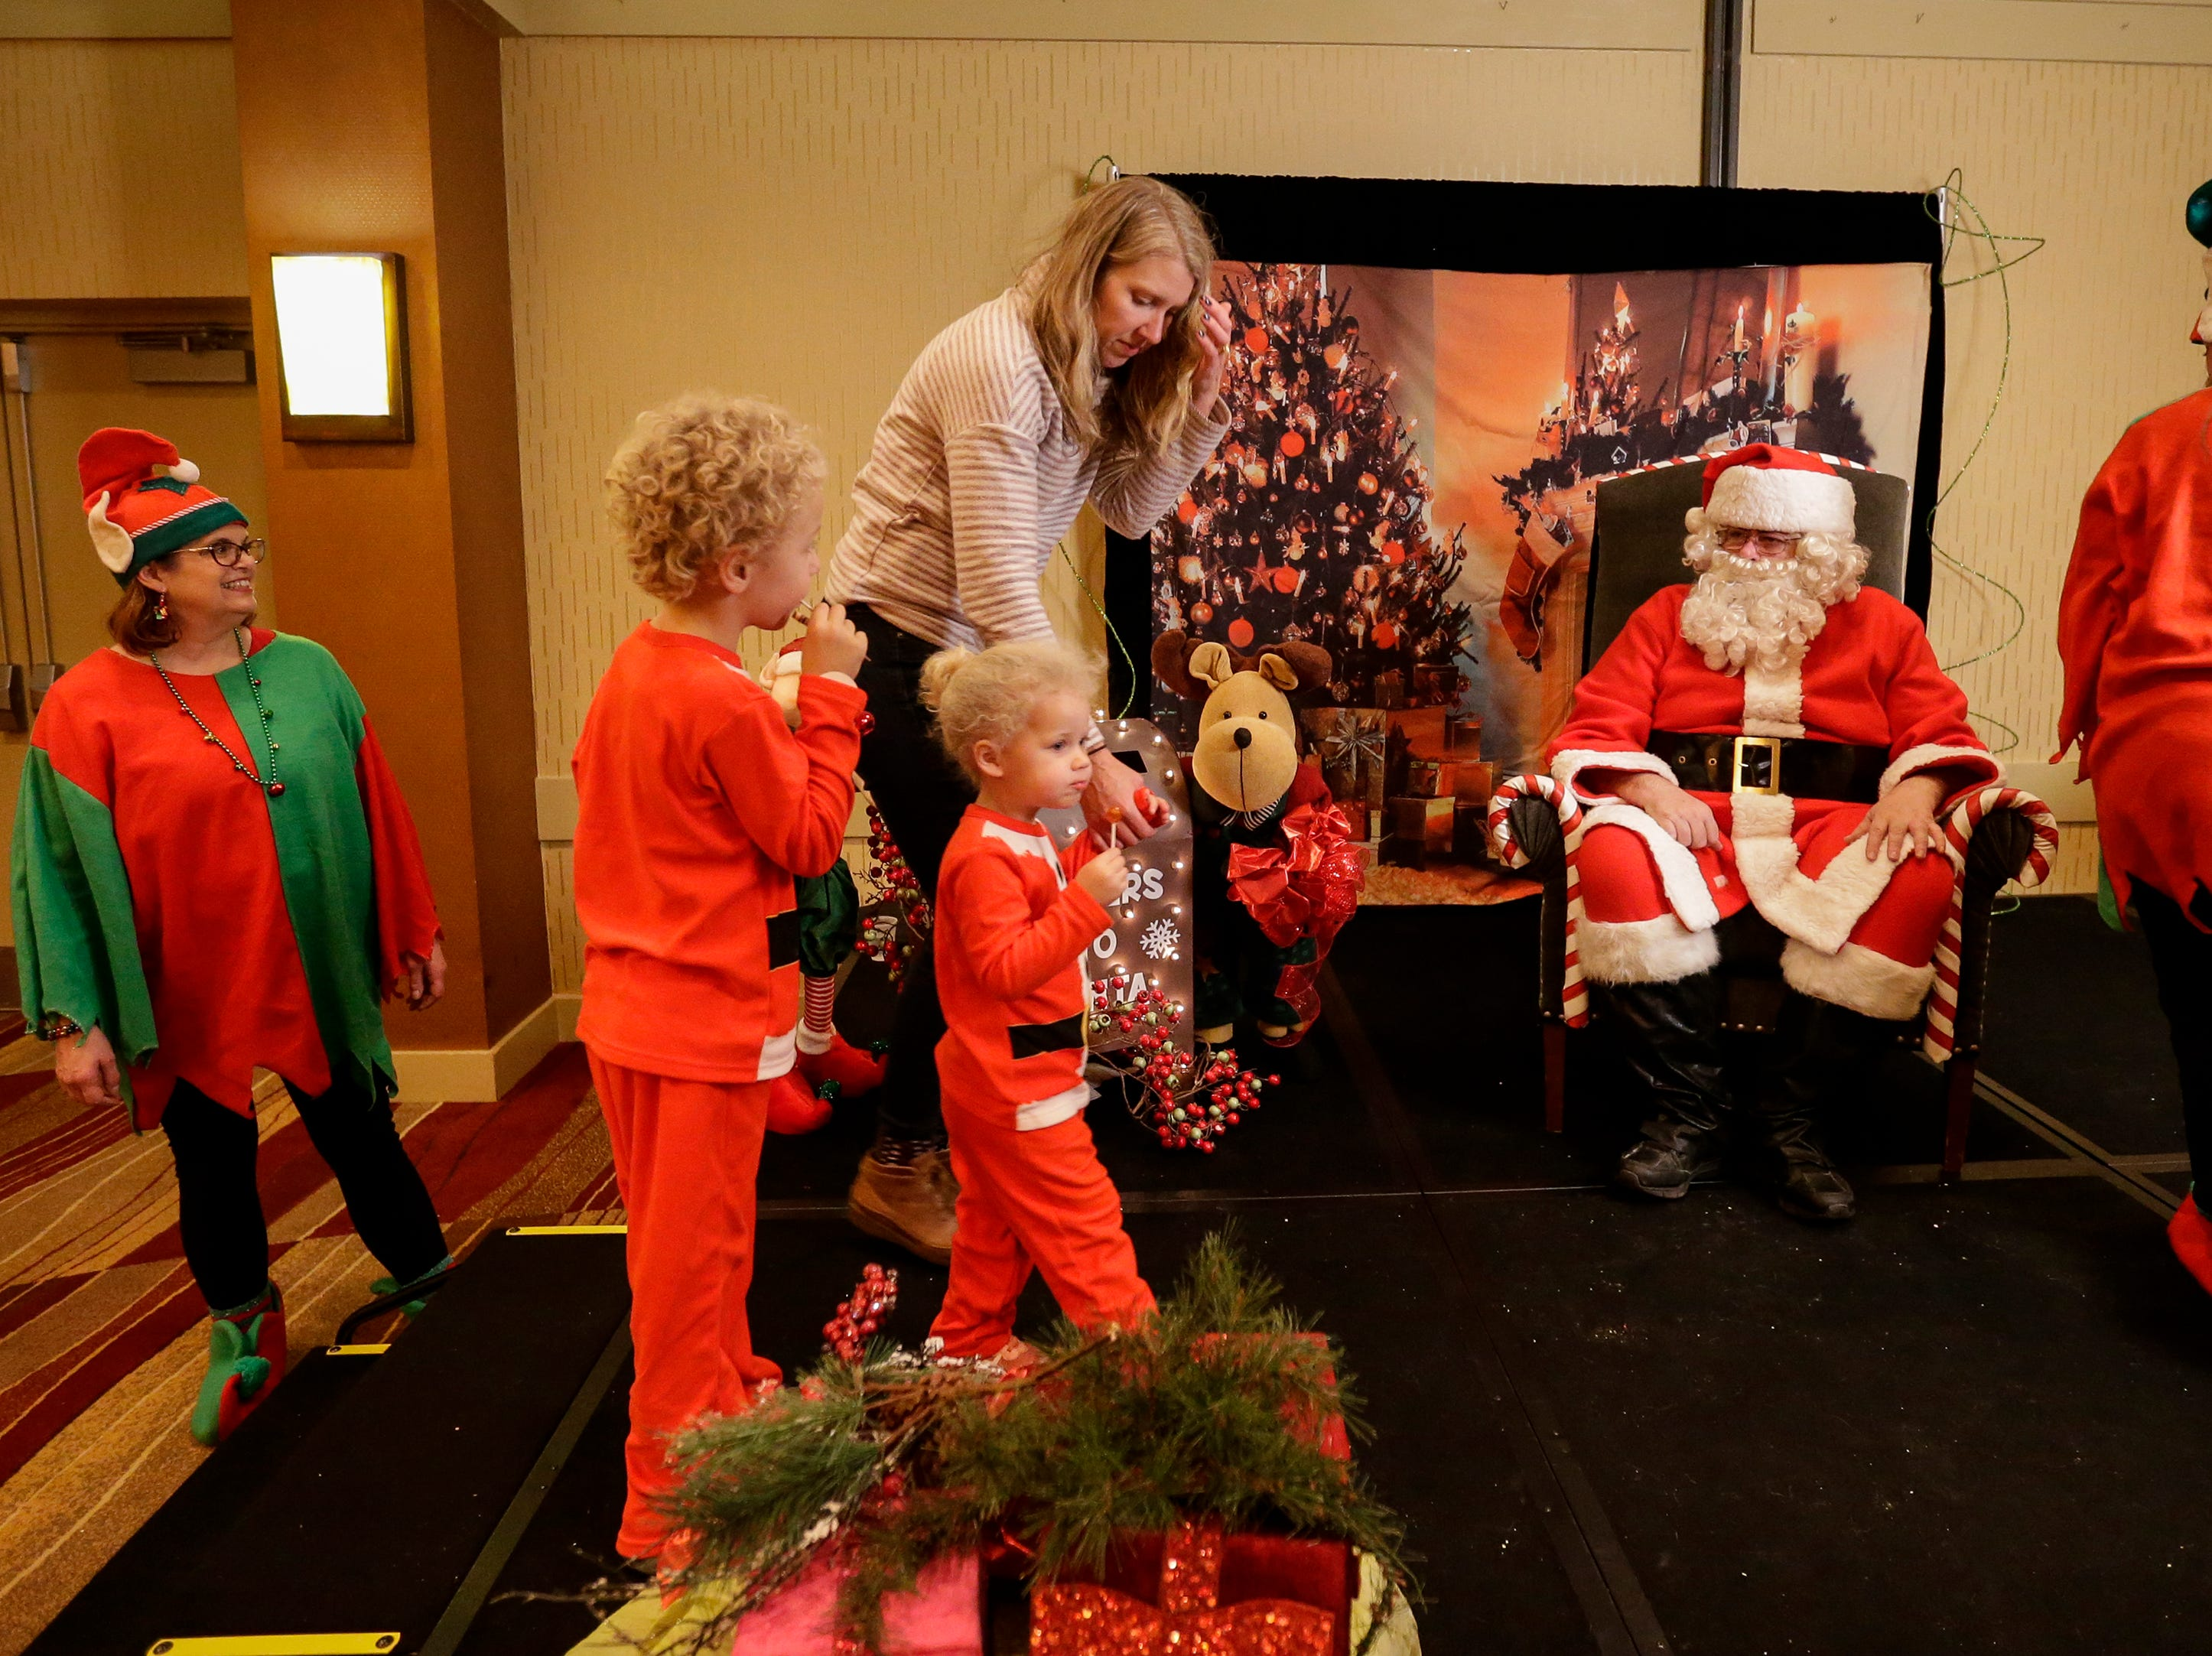 Molly Kafka takes Teddy, 5, and Edith, 2, Crain to visit Santa at Santa's North Pole at the Holiday Inn Saturday, December 8, 2018, in Manitowoc, Wis. Joshua Clark/USA TODAY NETWORK-Wisconsin